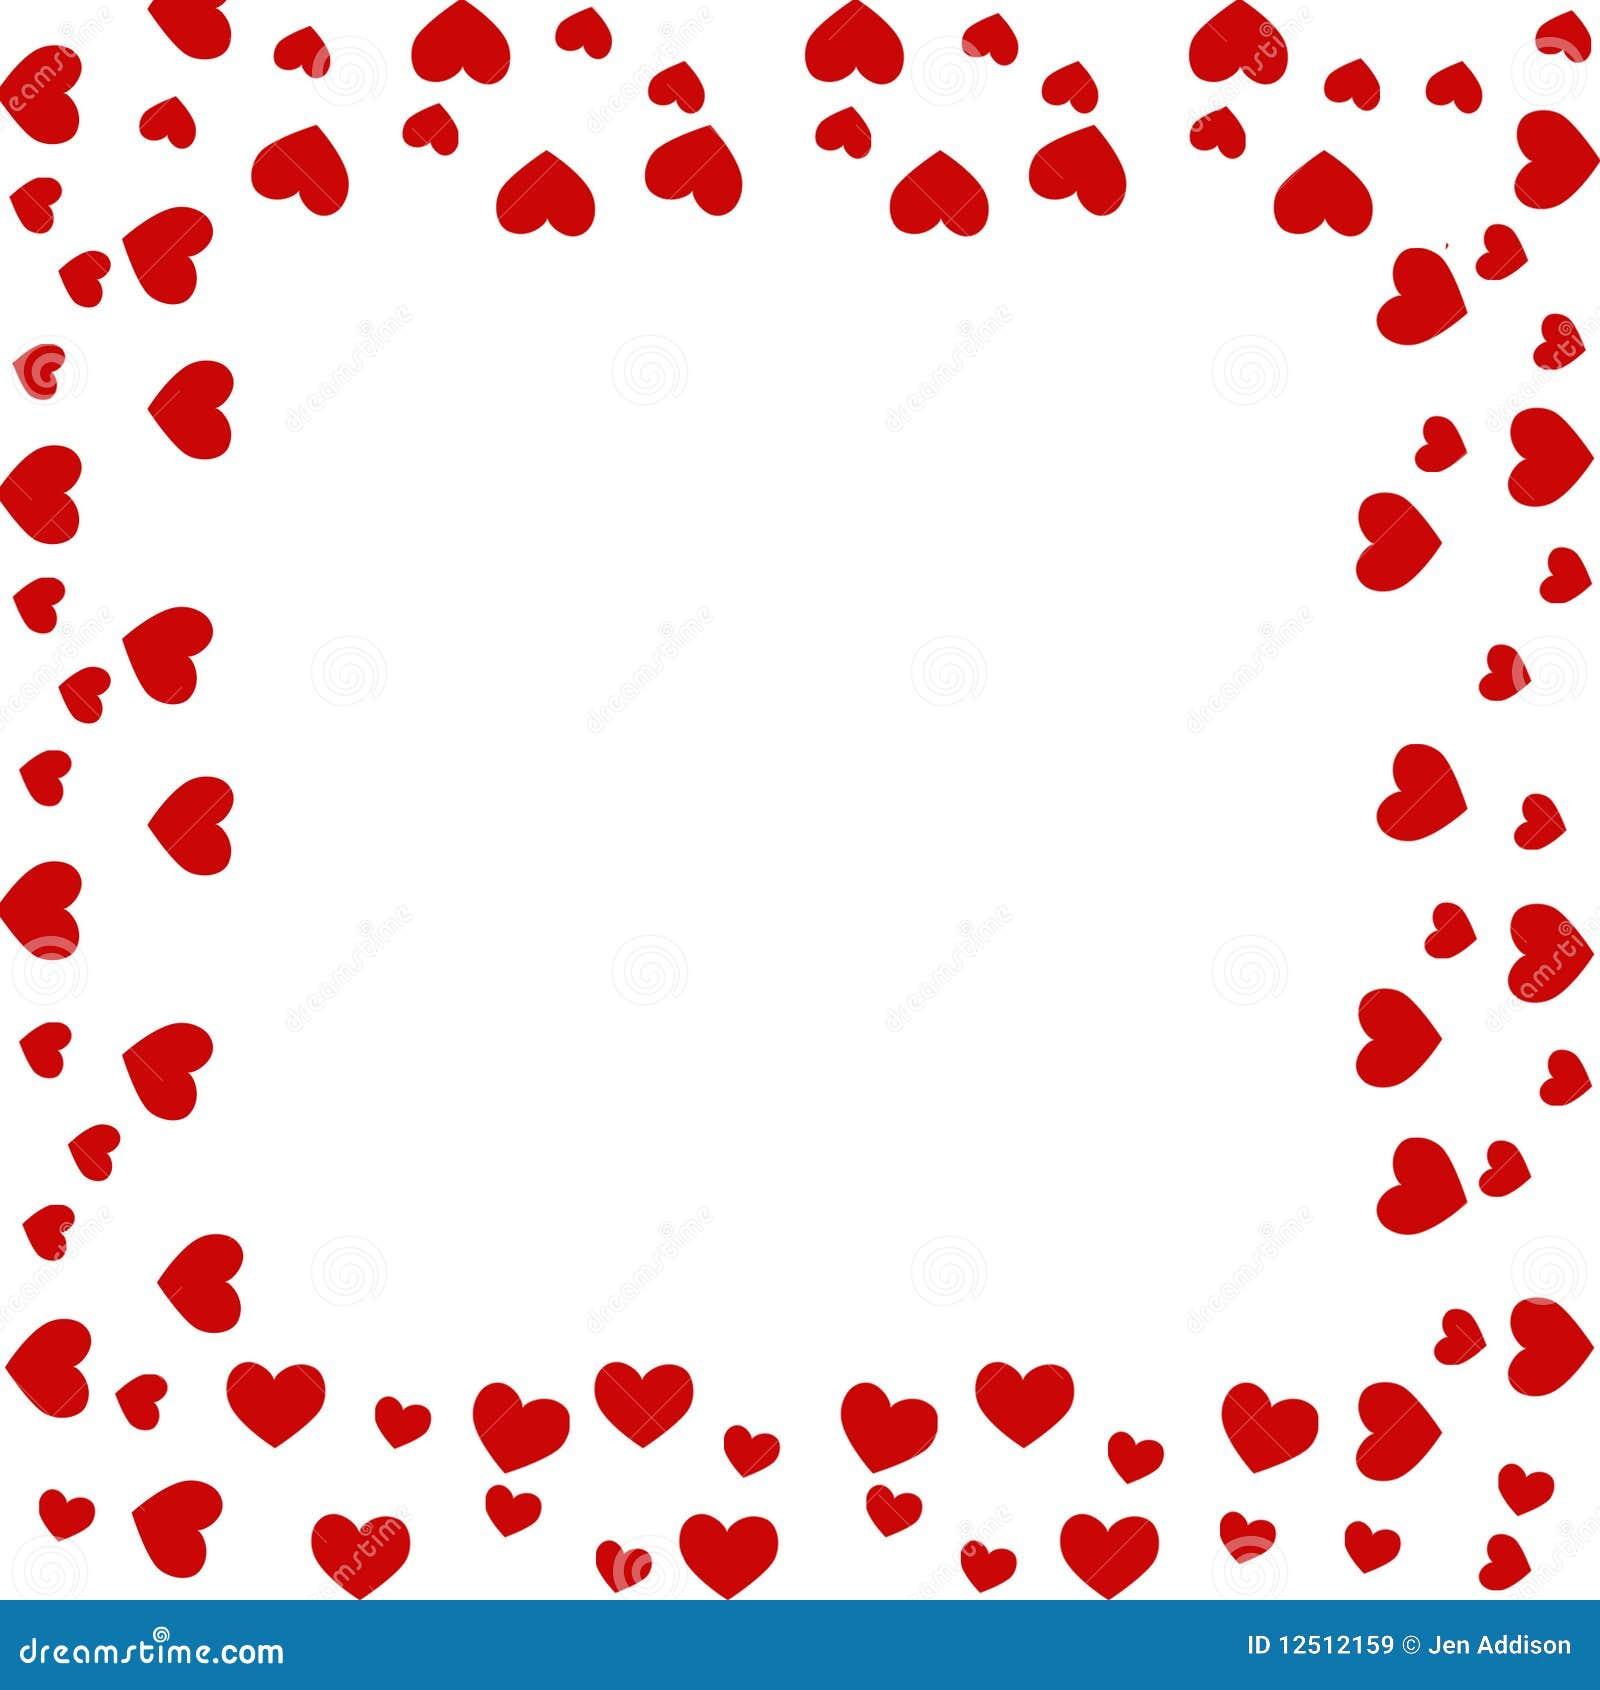 free heart border  Heart border stock illustration. Illustration of pink - 12512159